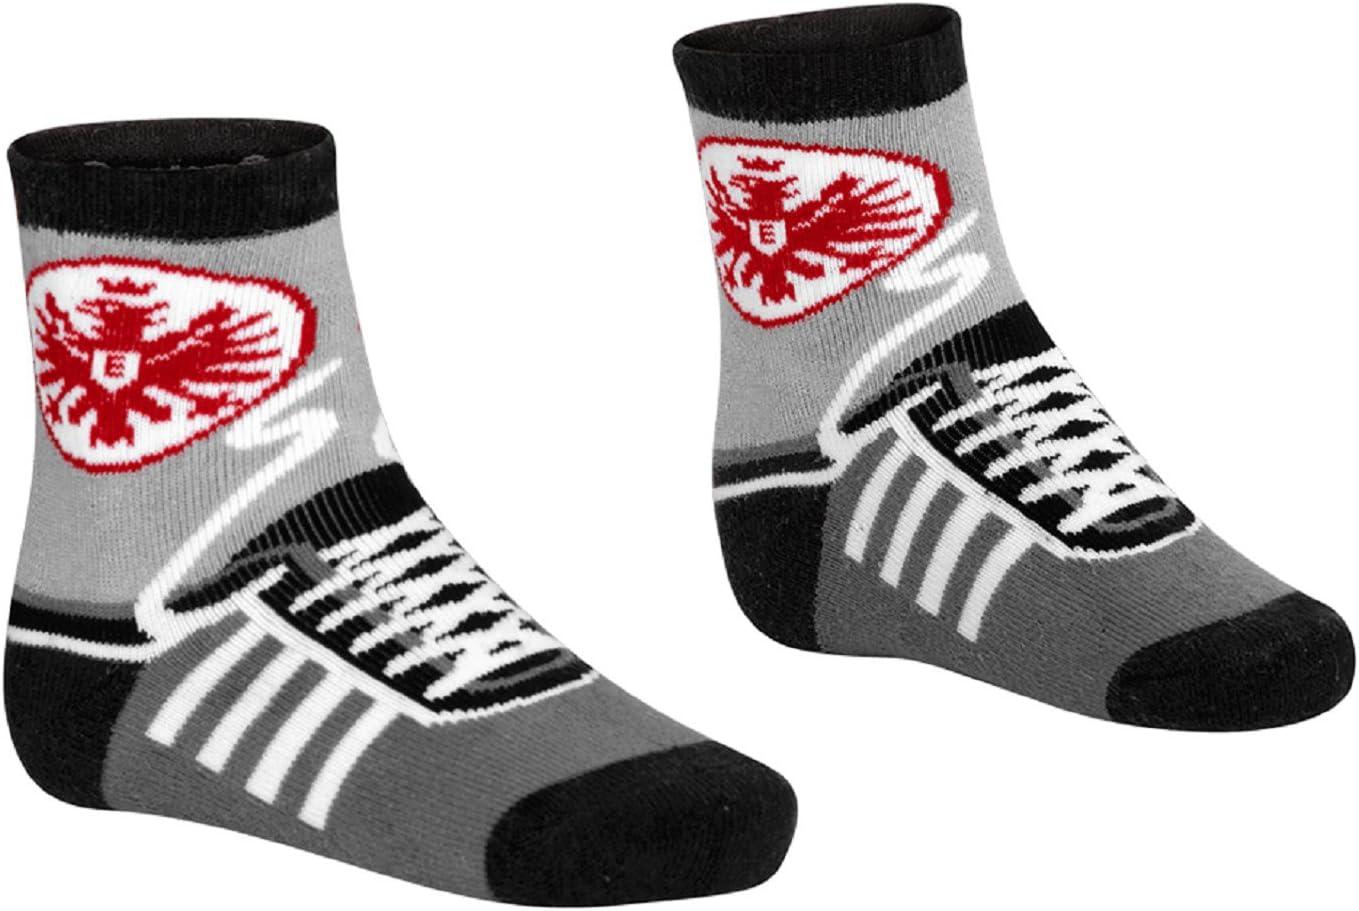 Kindersocke Sneaker Gr/ö/ße 25-28 1 Paar mit aufgedruckten Schn/ürsenkeln Eintracht Frankfurt